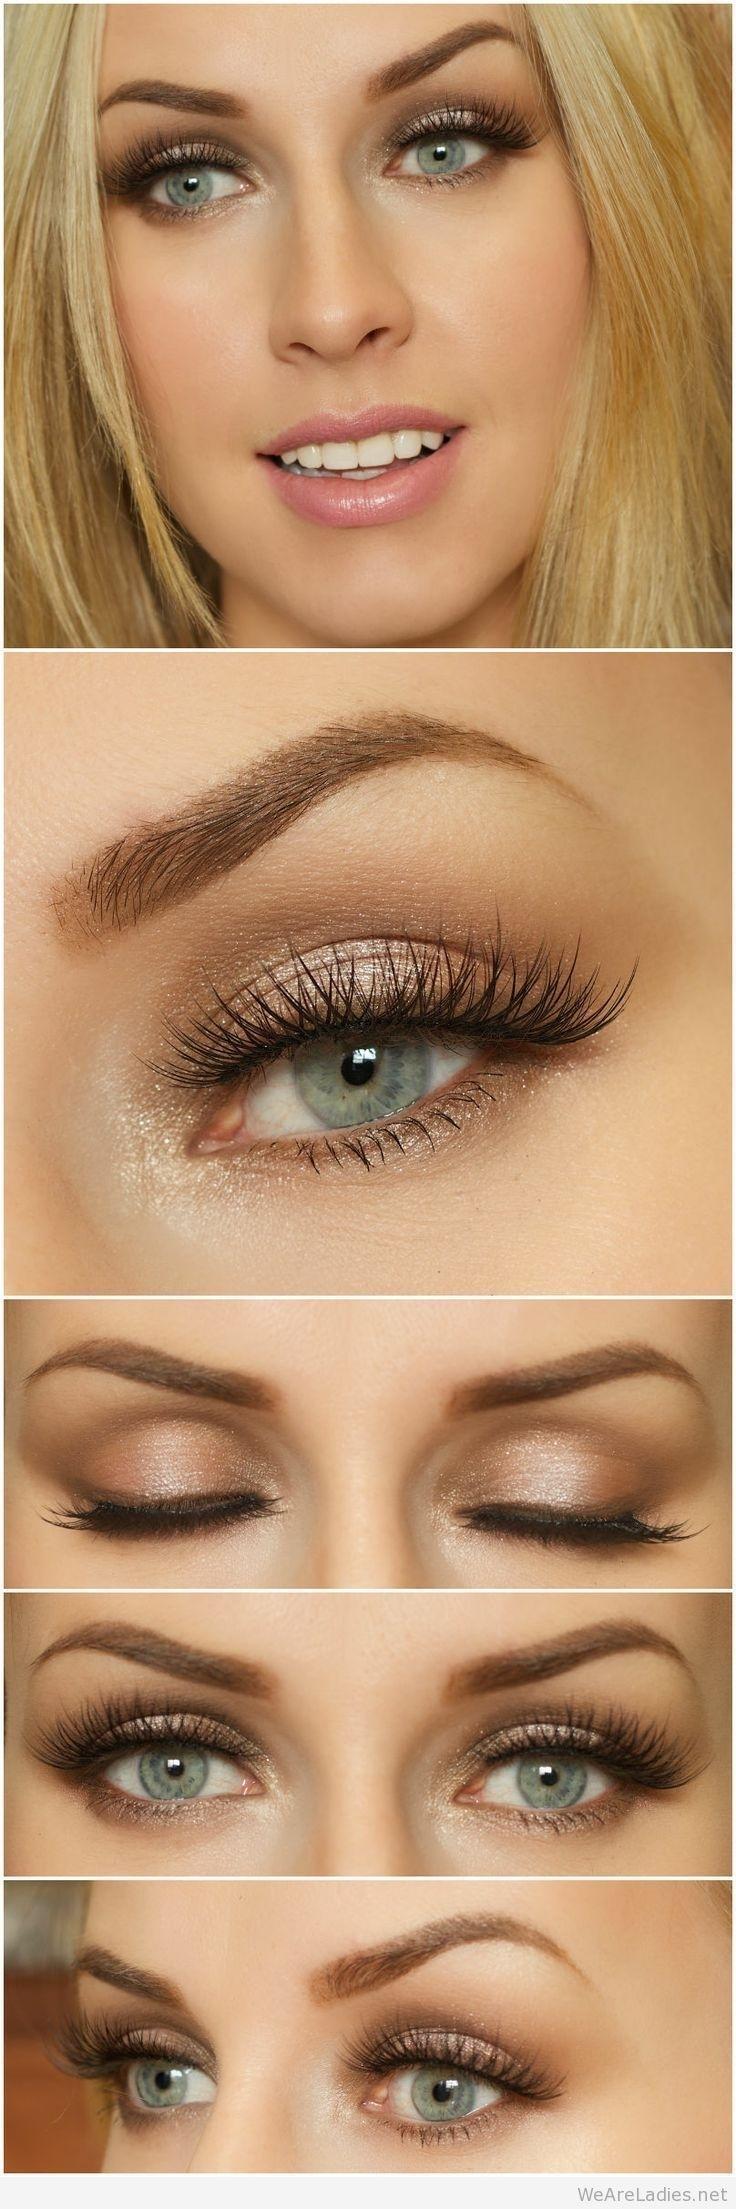 best makeup for hazel eyes and blonde hair | saubhaya makeup